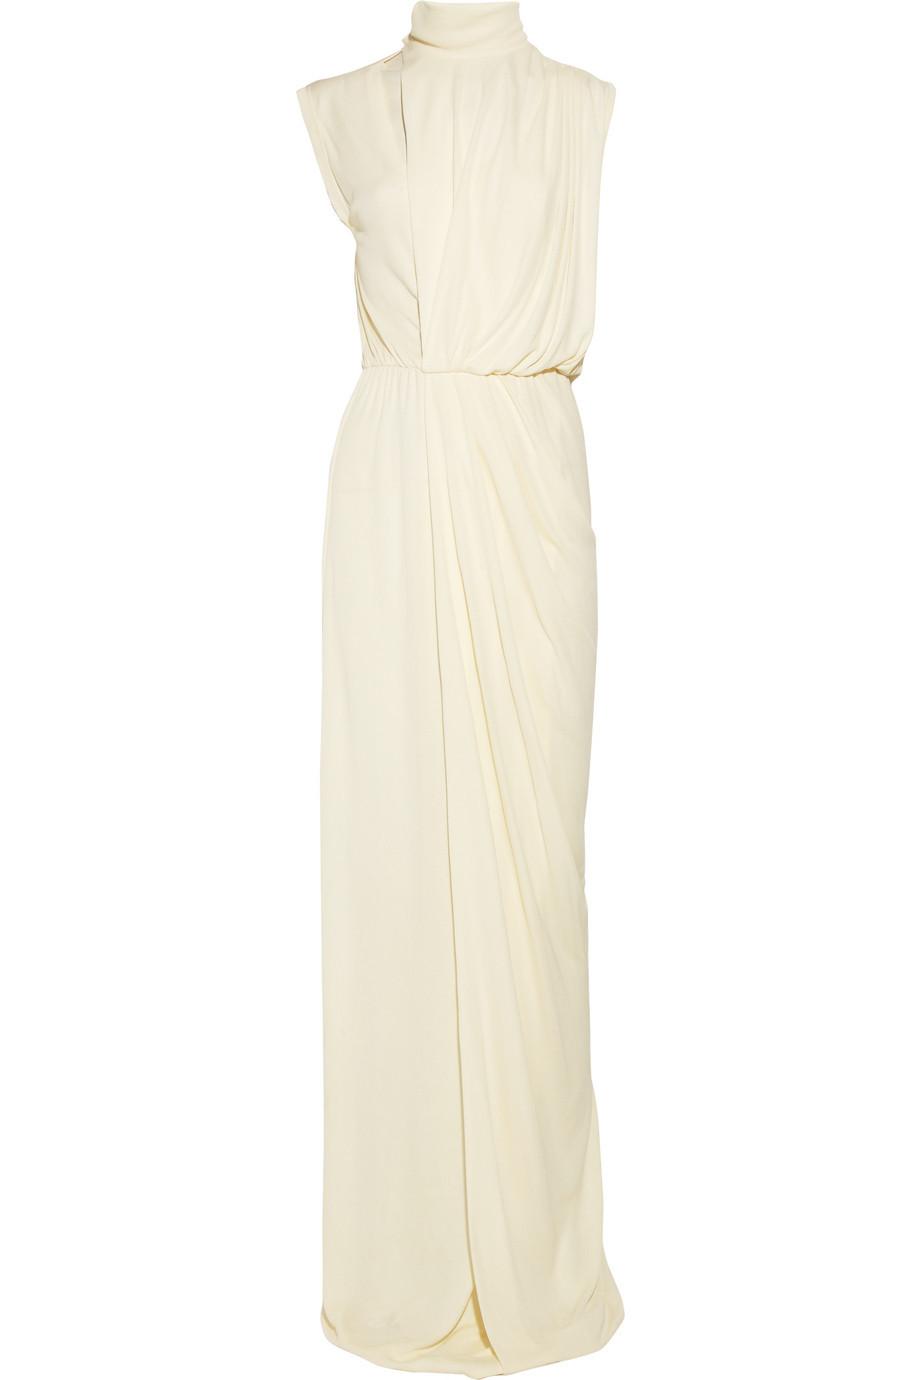 Draped-crepe-wedding-dress-high-neck.full